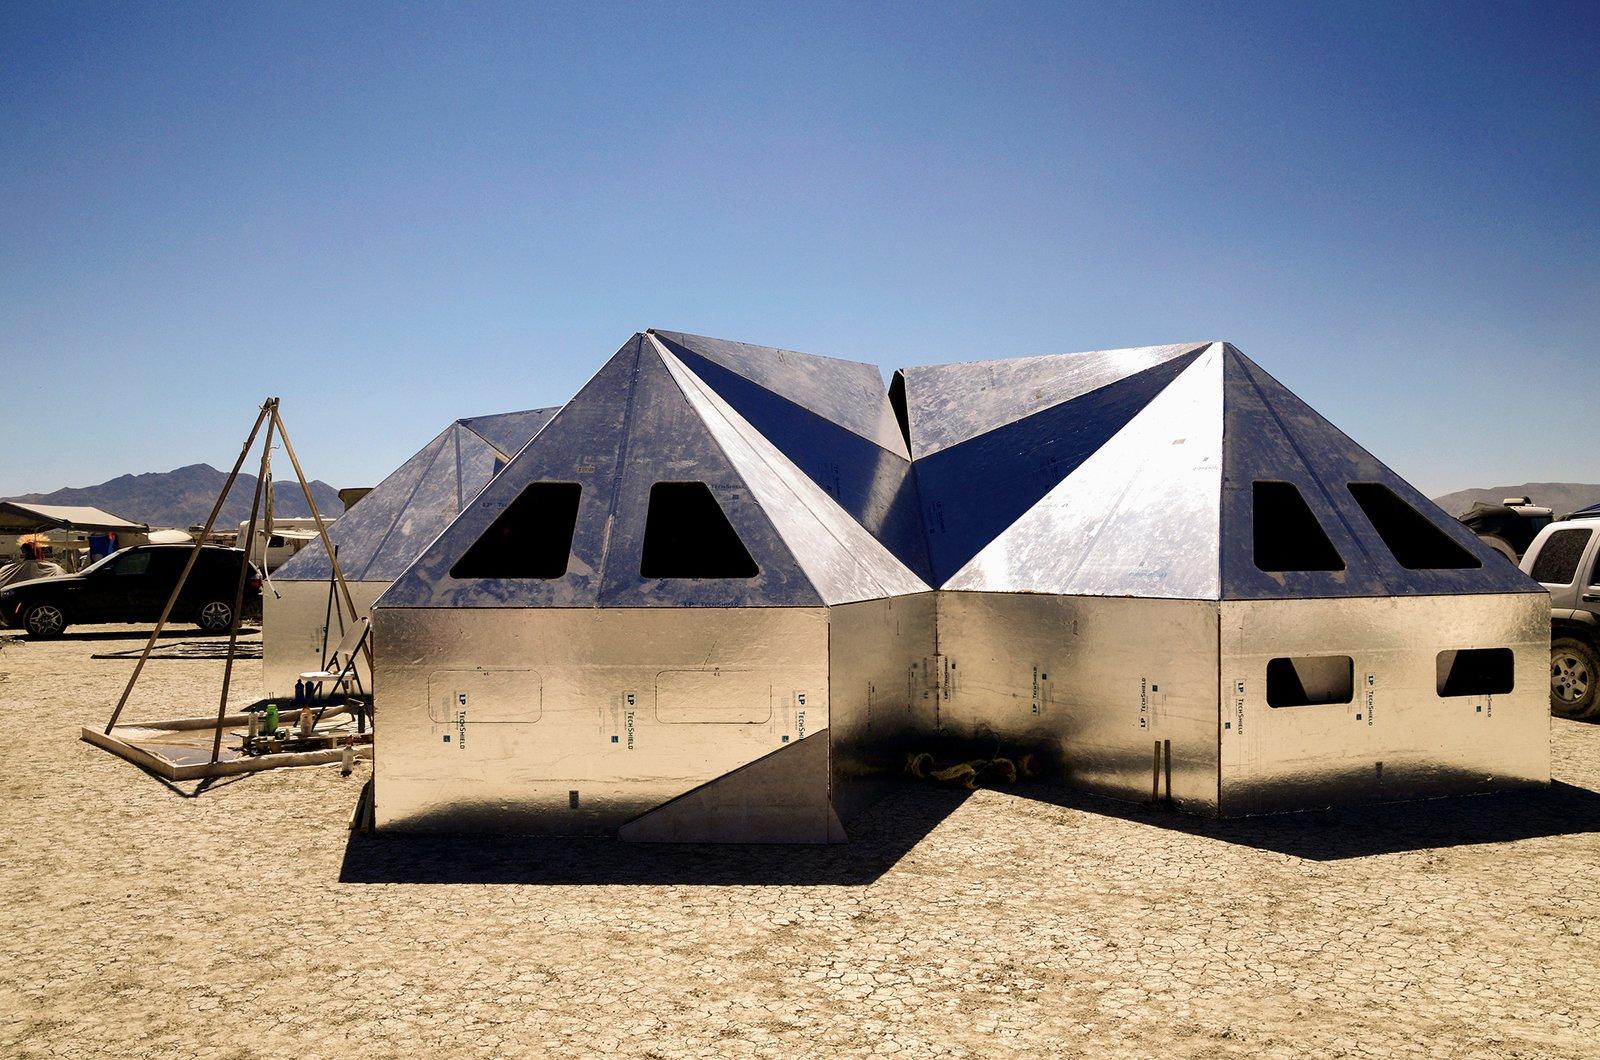 Exterior, Prefab, Tent, Metal, and Gable Pentayurts at Easy Buckaroo Camp  Exterior Tent Gable Photos from 16 Otherworldly Photos of Burning Man Architecture